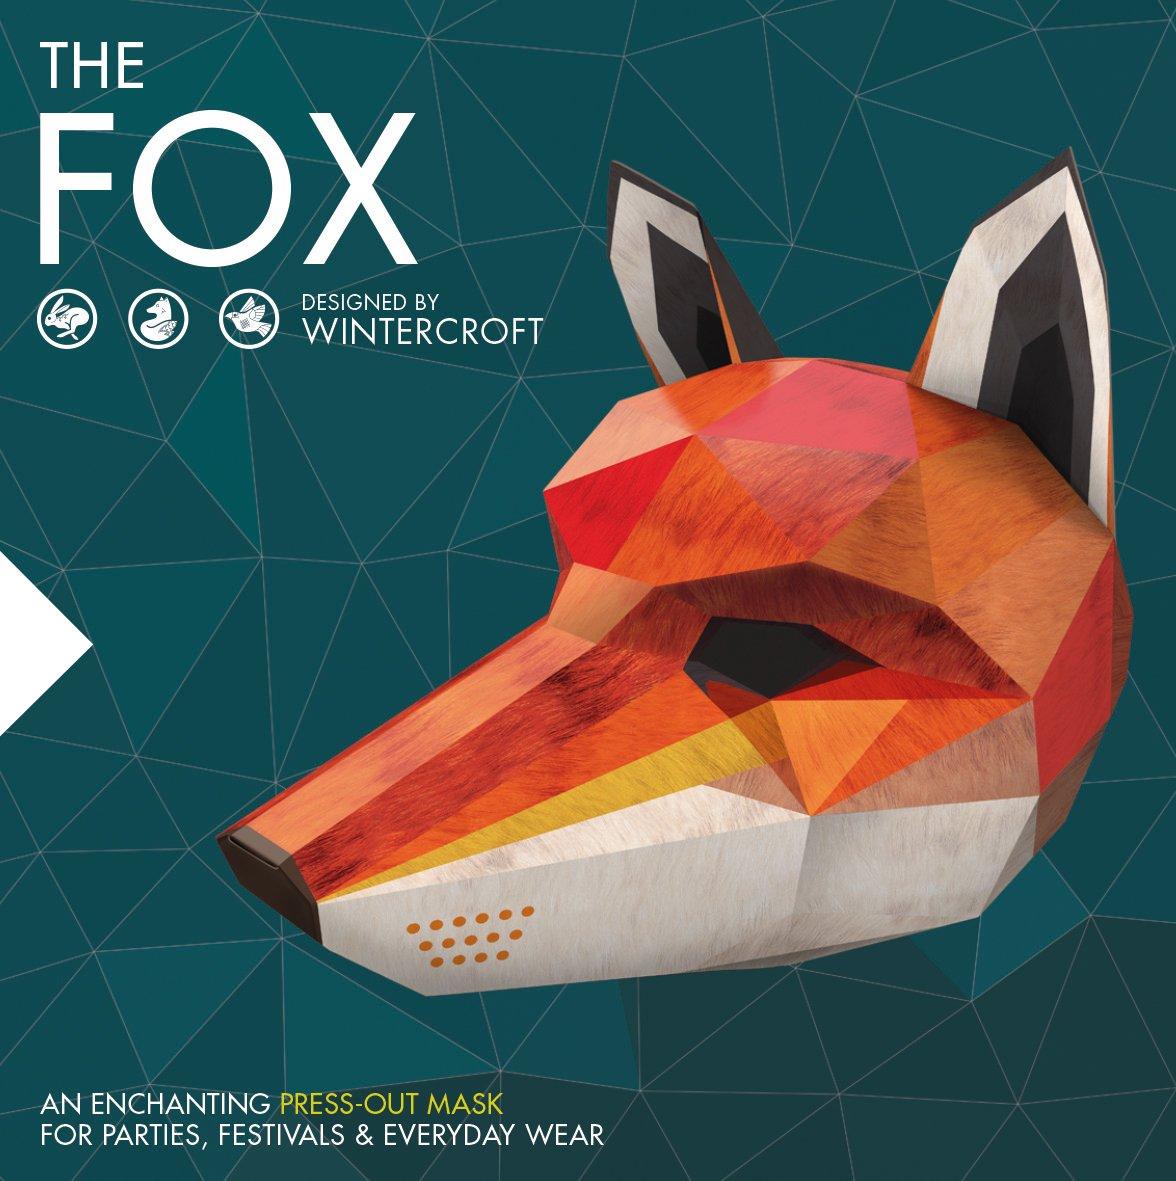 Wintercroft Masks Fox: Amazon.es: Vv.Aa: Libros en idiomas ...